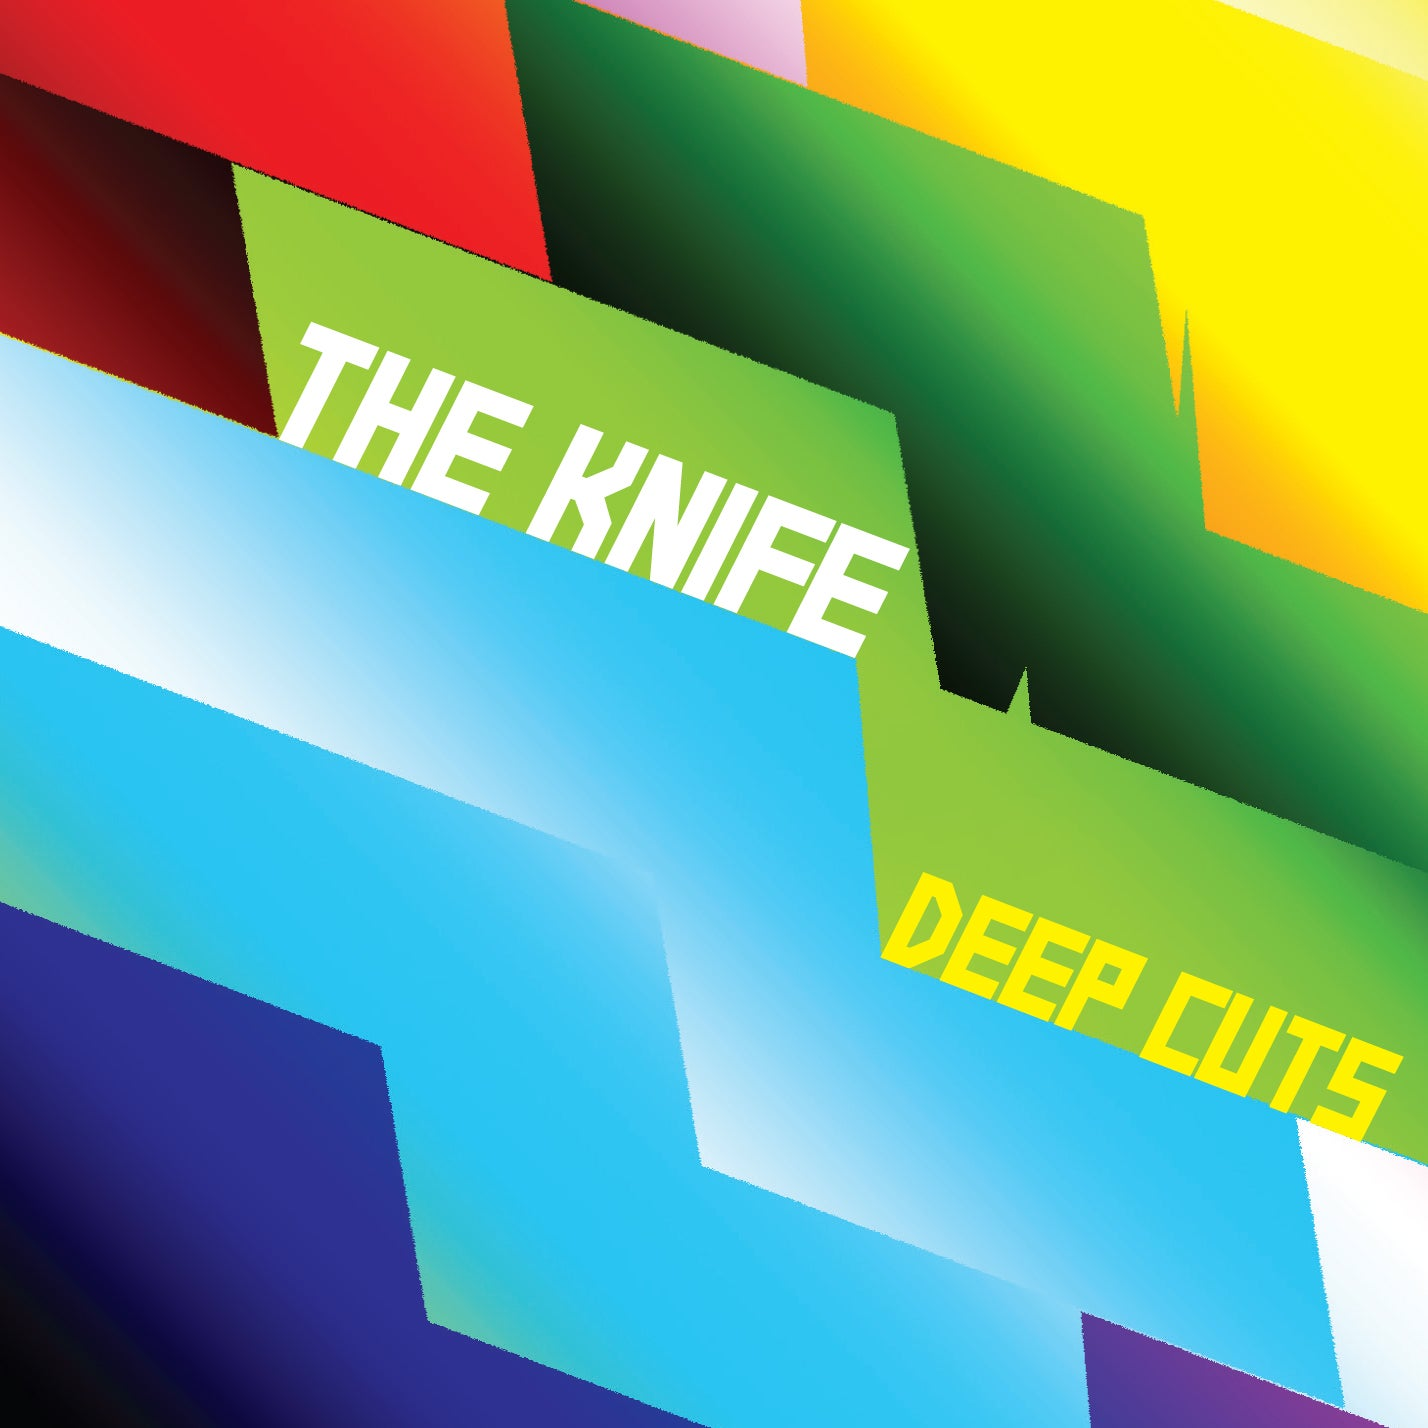 "The Knife 'Deep Cuts' (2x12"" vinyl)"